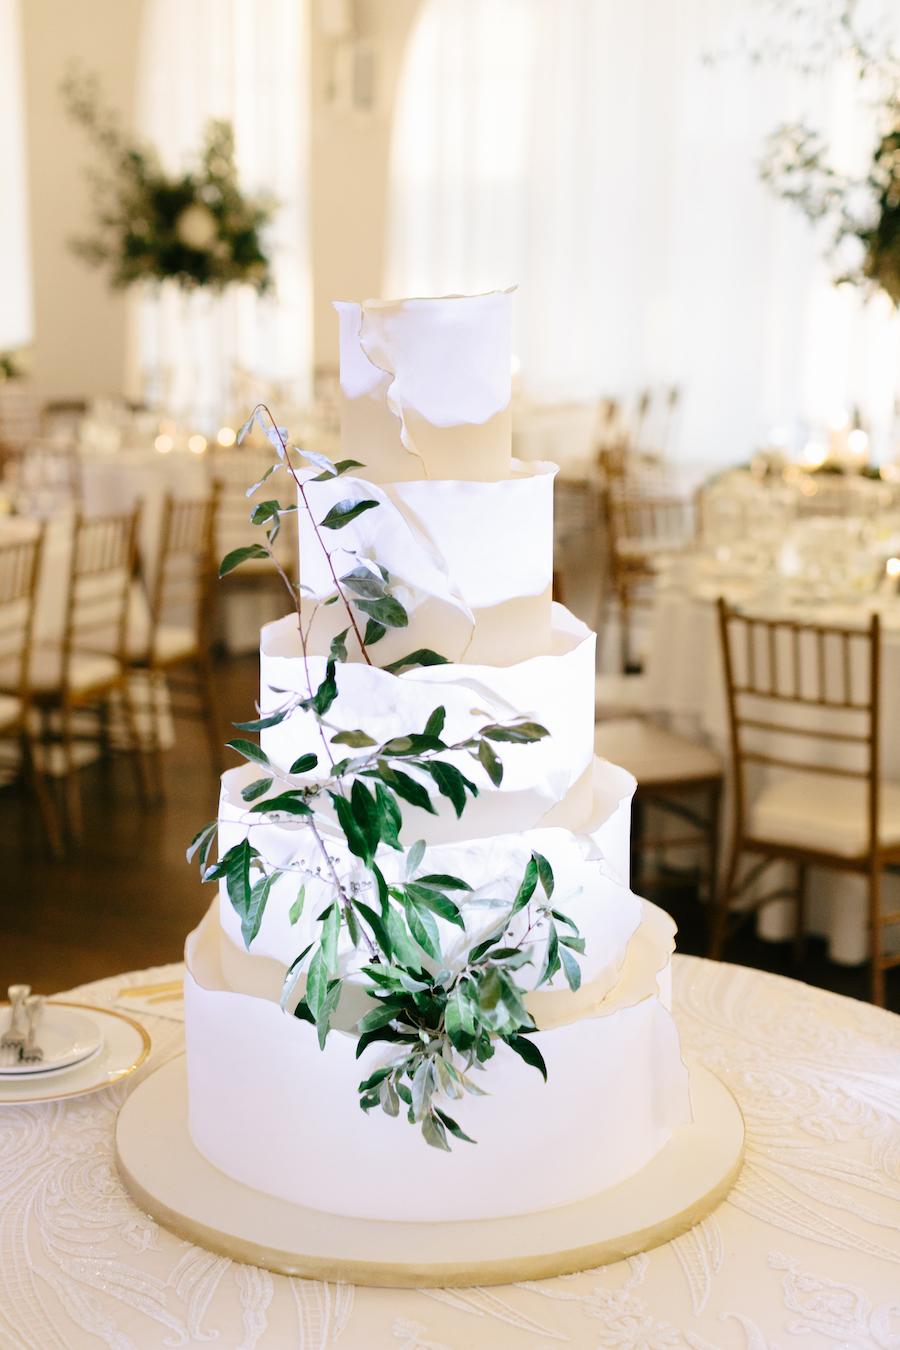 Garineh Ashjian wedding